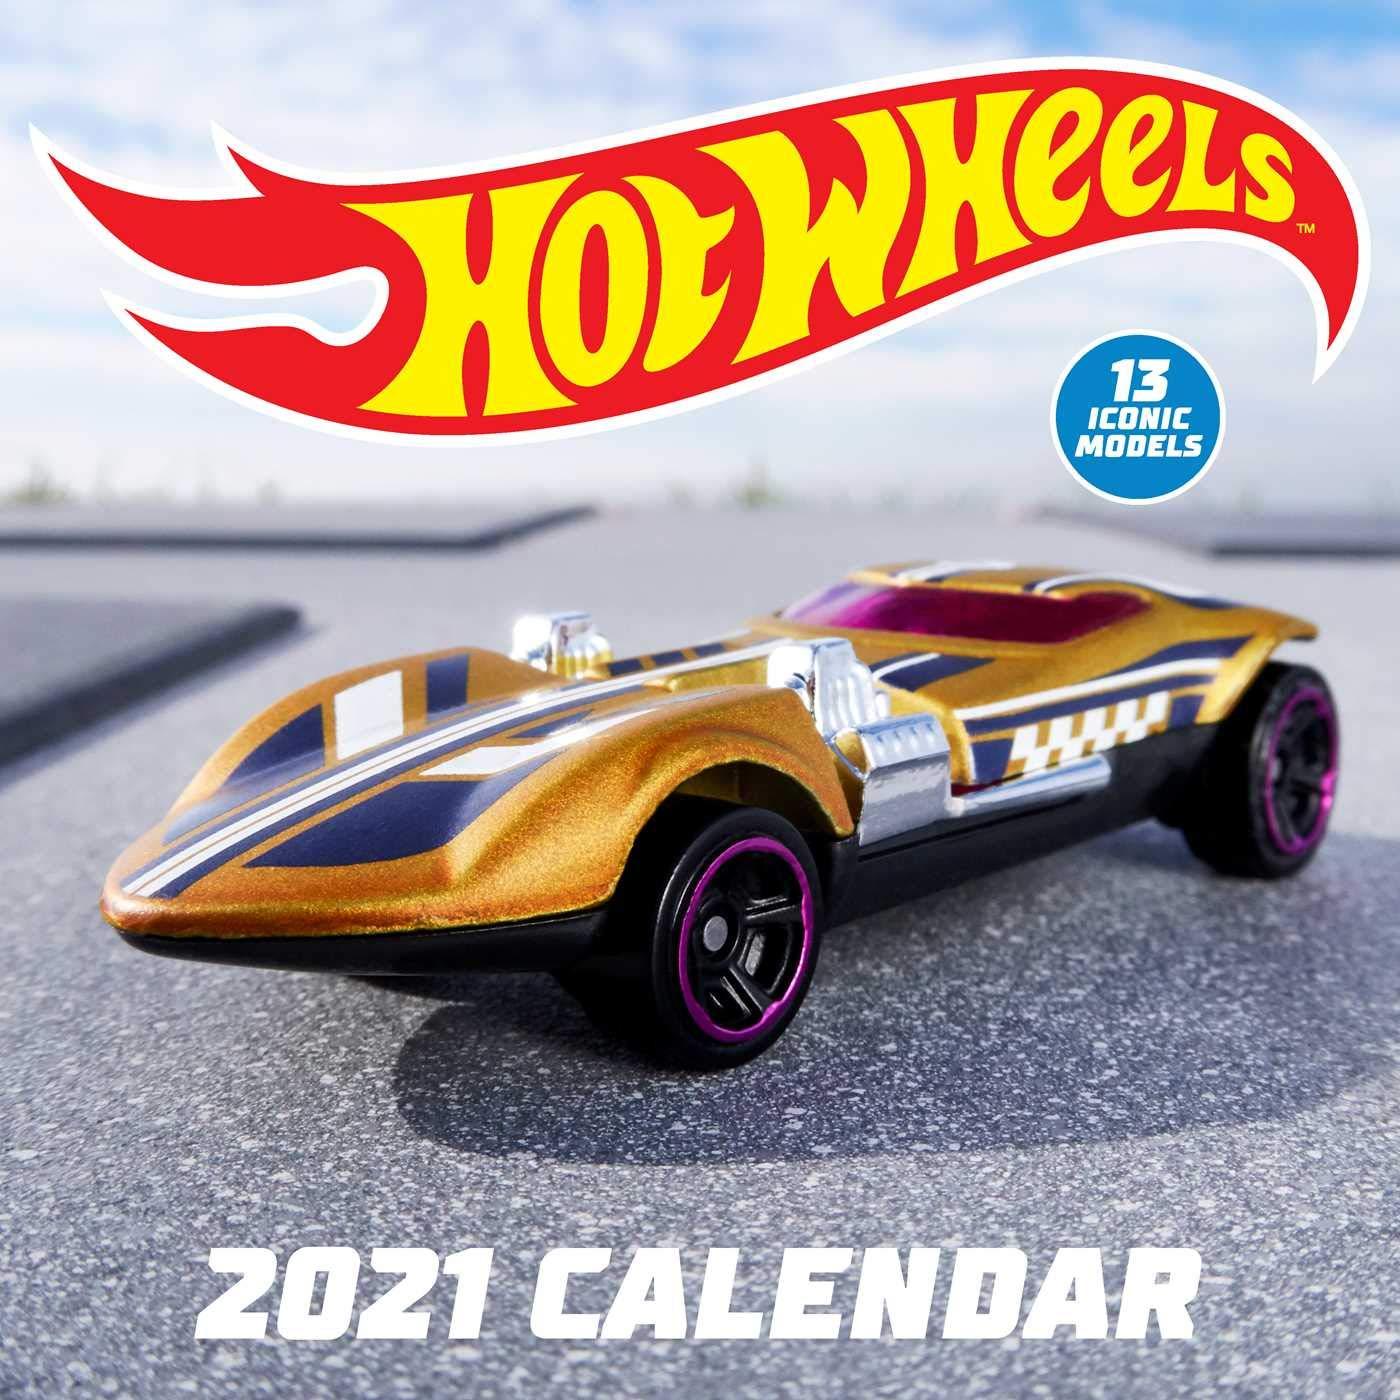 Hot Wheels 2021 Wall Calendar Mattel 9781419744723 Amazon Com Books